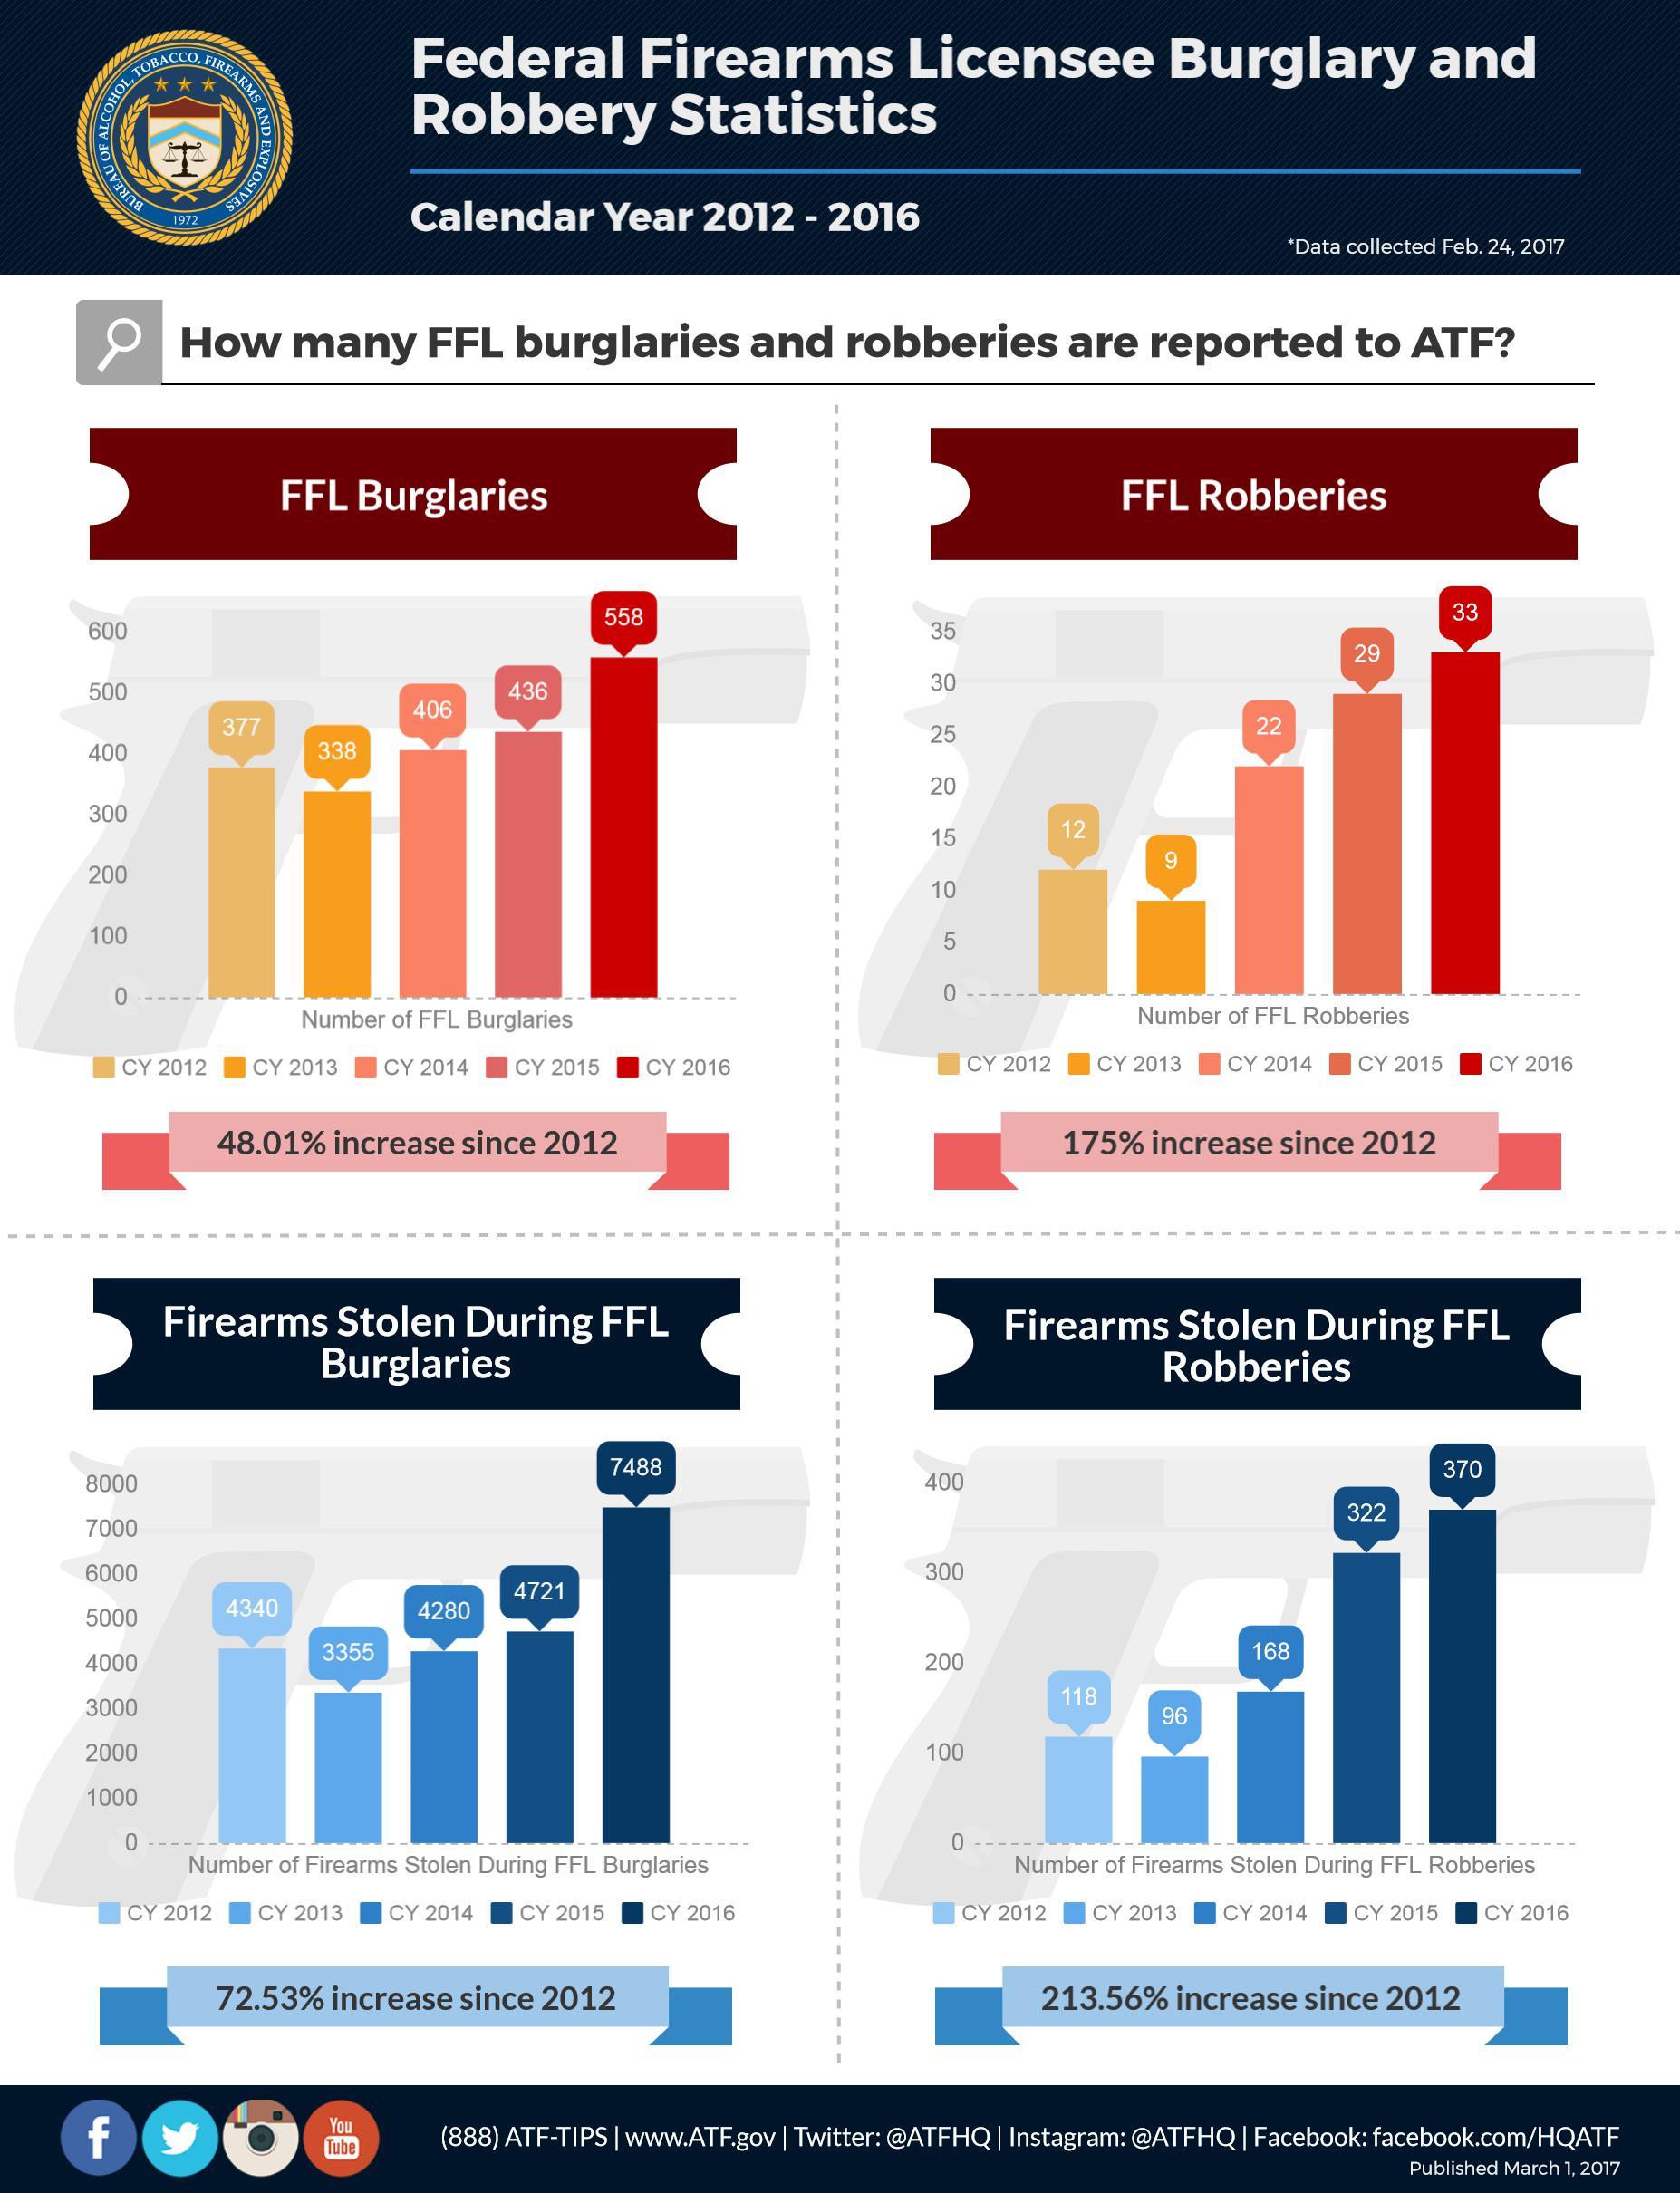 FFL Burglary and Robbery Statistics - Calendar years 2012 - 2016